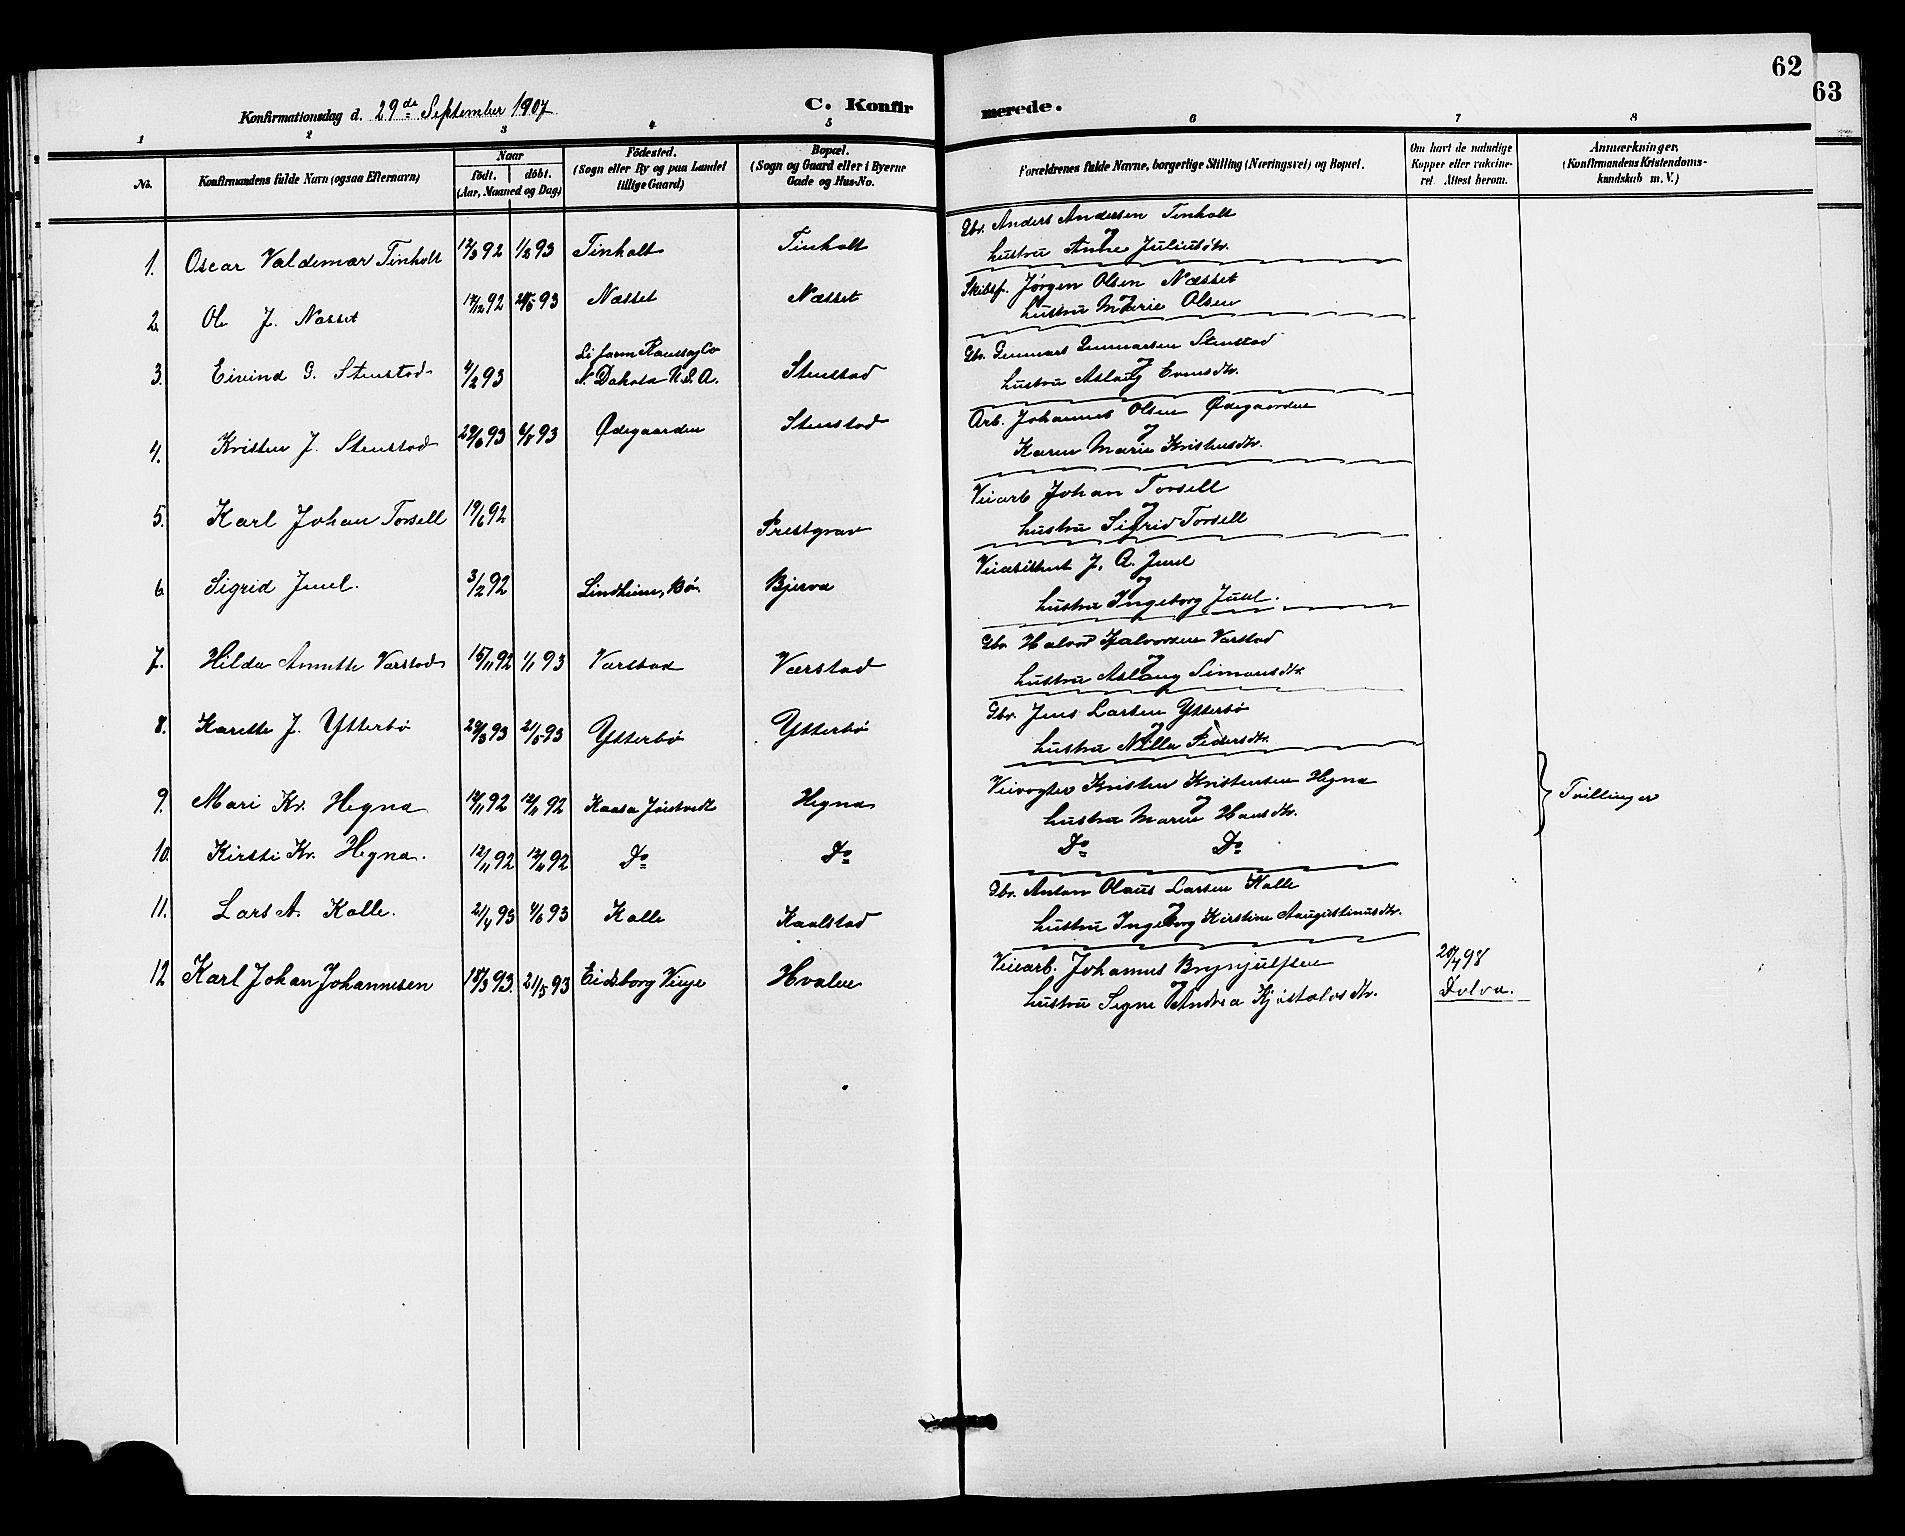 SAKO, Holla kirkebøker, G/Gb/L0002: Klokkerbok nr. II 2, 1897-1913, s. 62